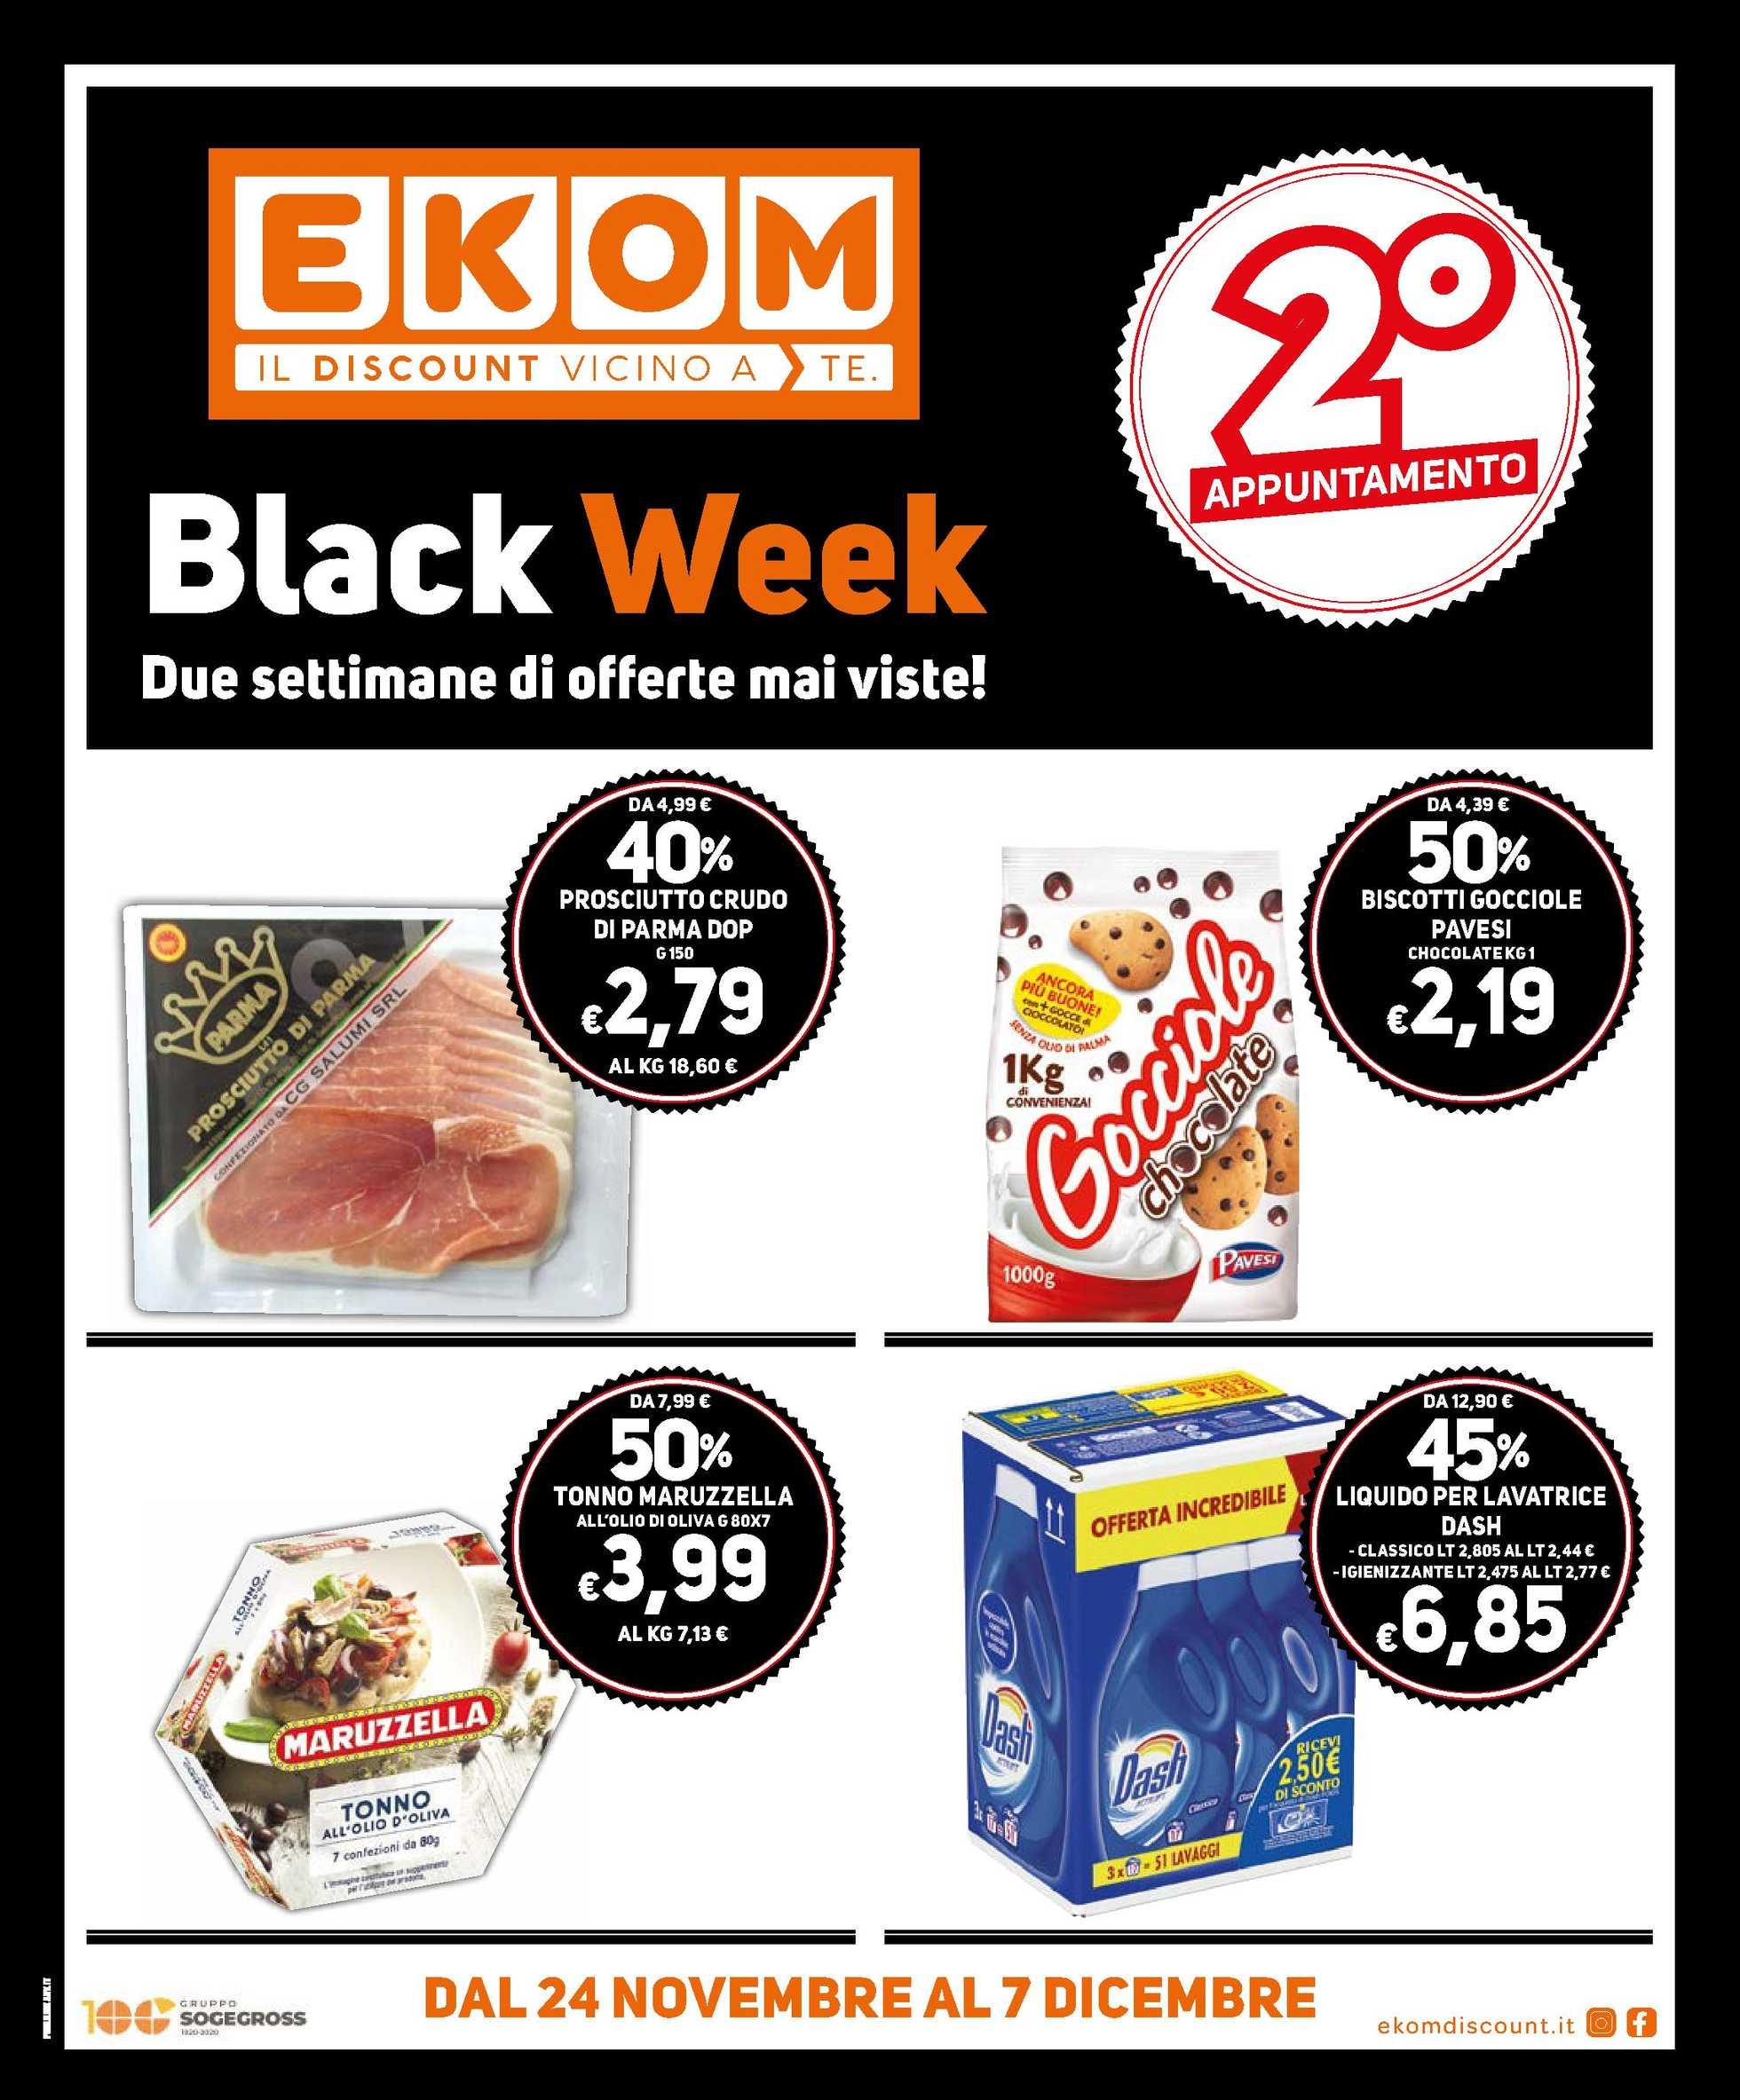 Ekom - offerte valide dal 24.11.2020 al 07.12.2020 - pagina 1.